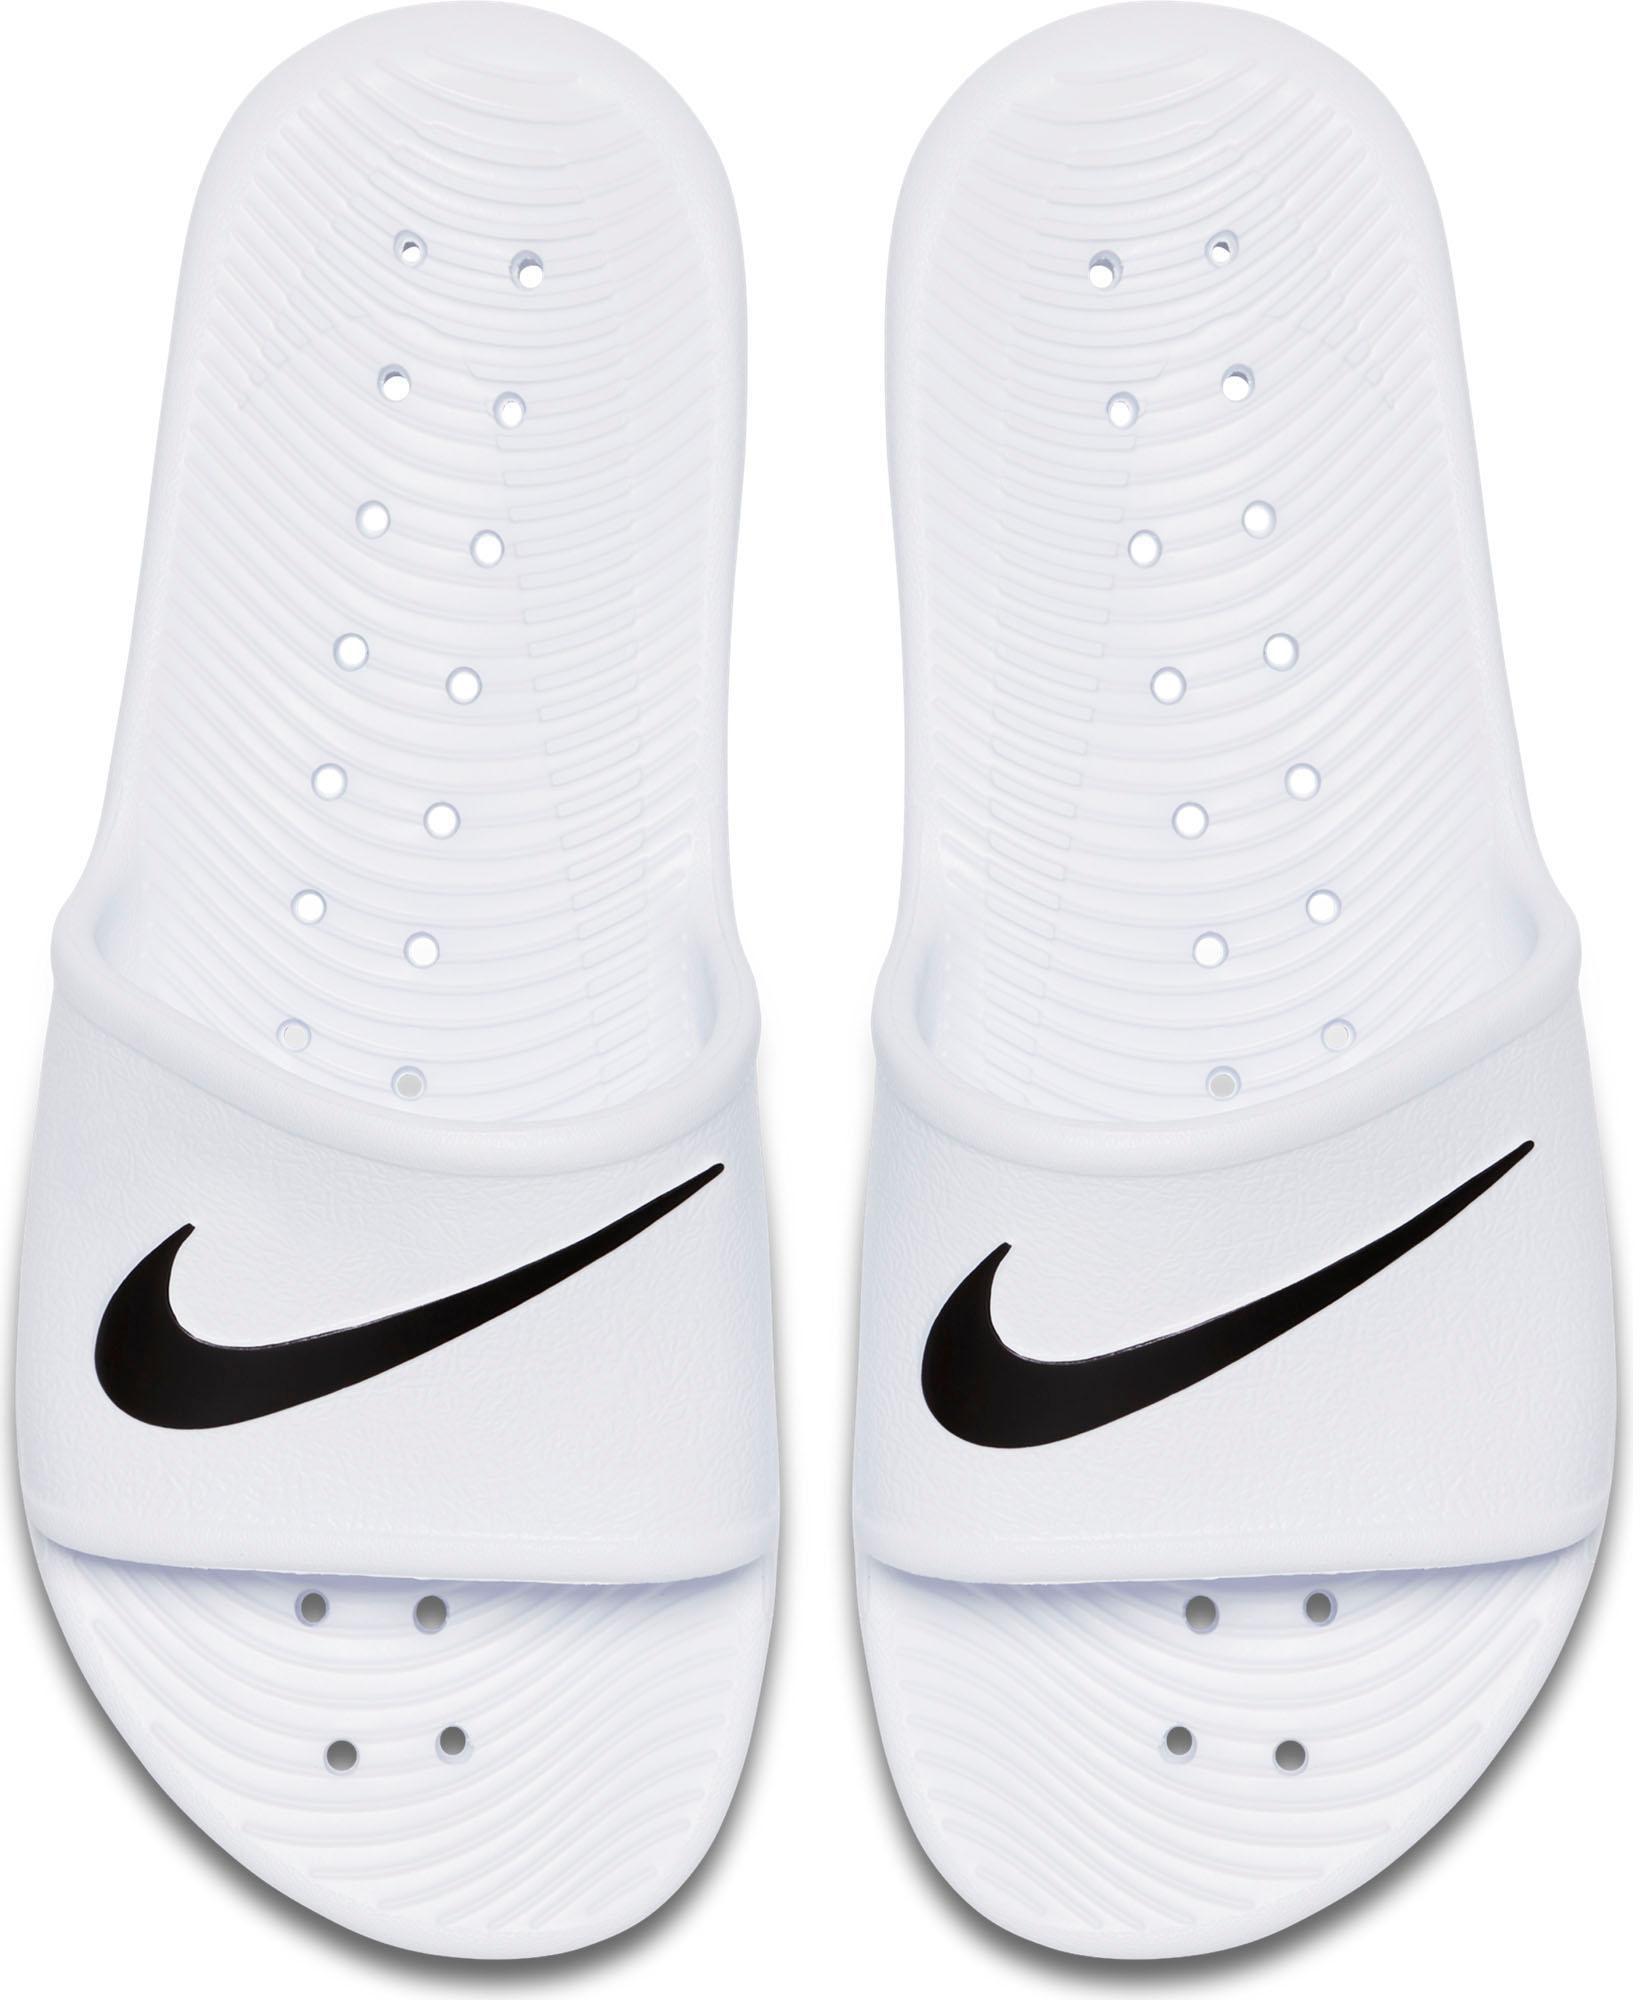 Nike Sportswear Badesandale »Wmns Kawa Shower Sandal« günstig kaufen | BAUR